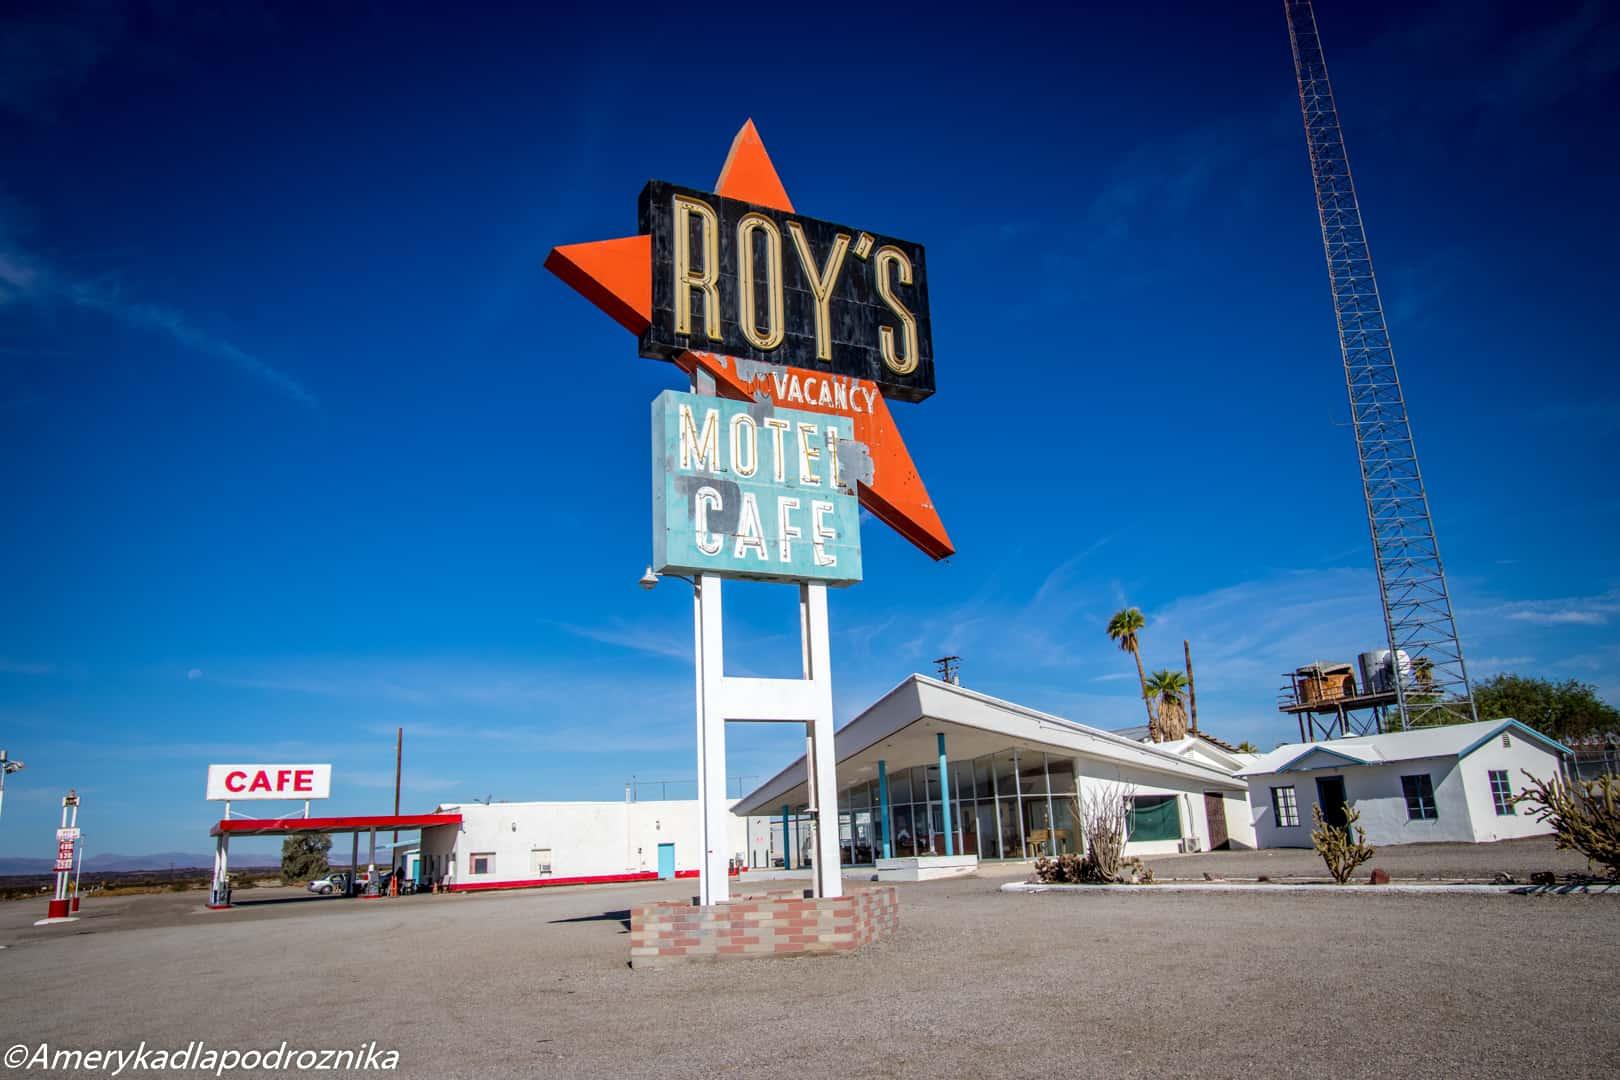 droga 66, roy's motel